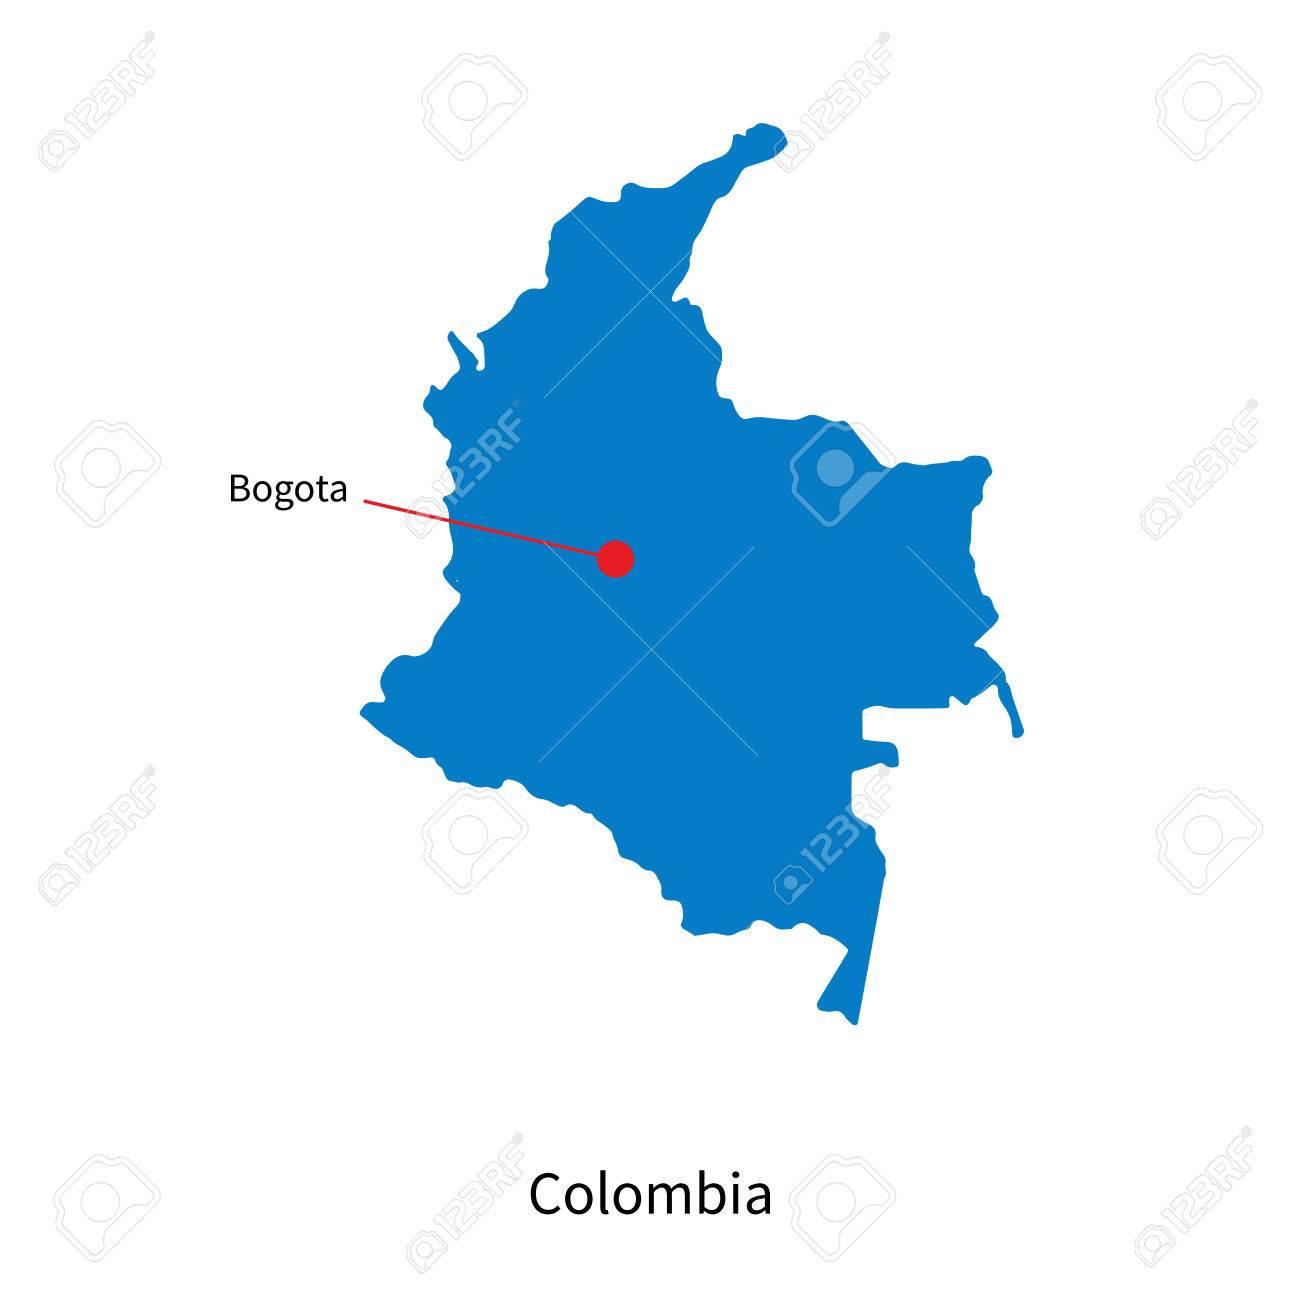 aaa maps directions aaa maps tourbookÃ'Ã'® maps directions. aaa maps directions aaa maps directions aaa maps tourbookÃ'Ã'Â